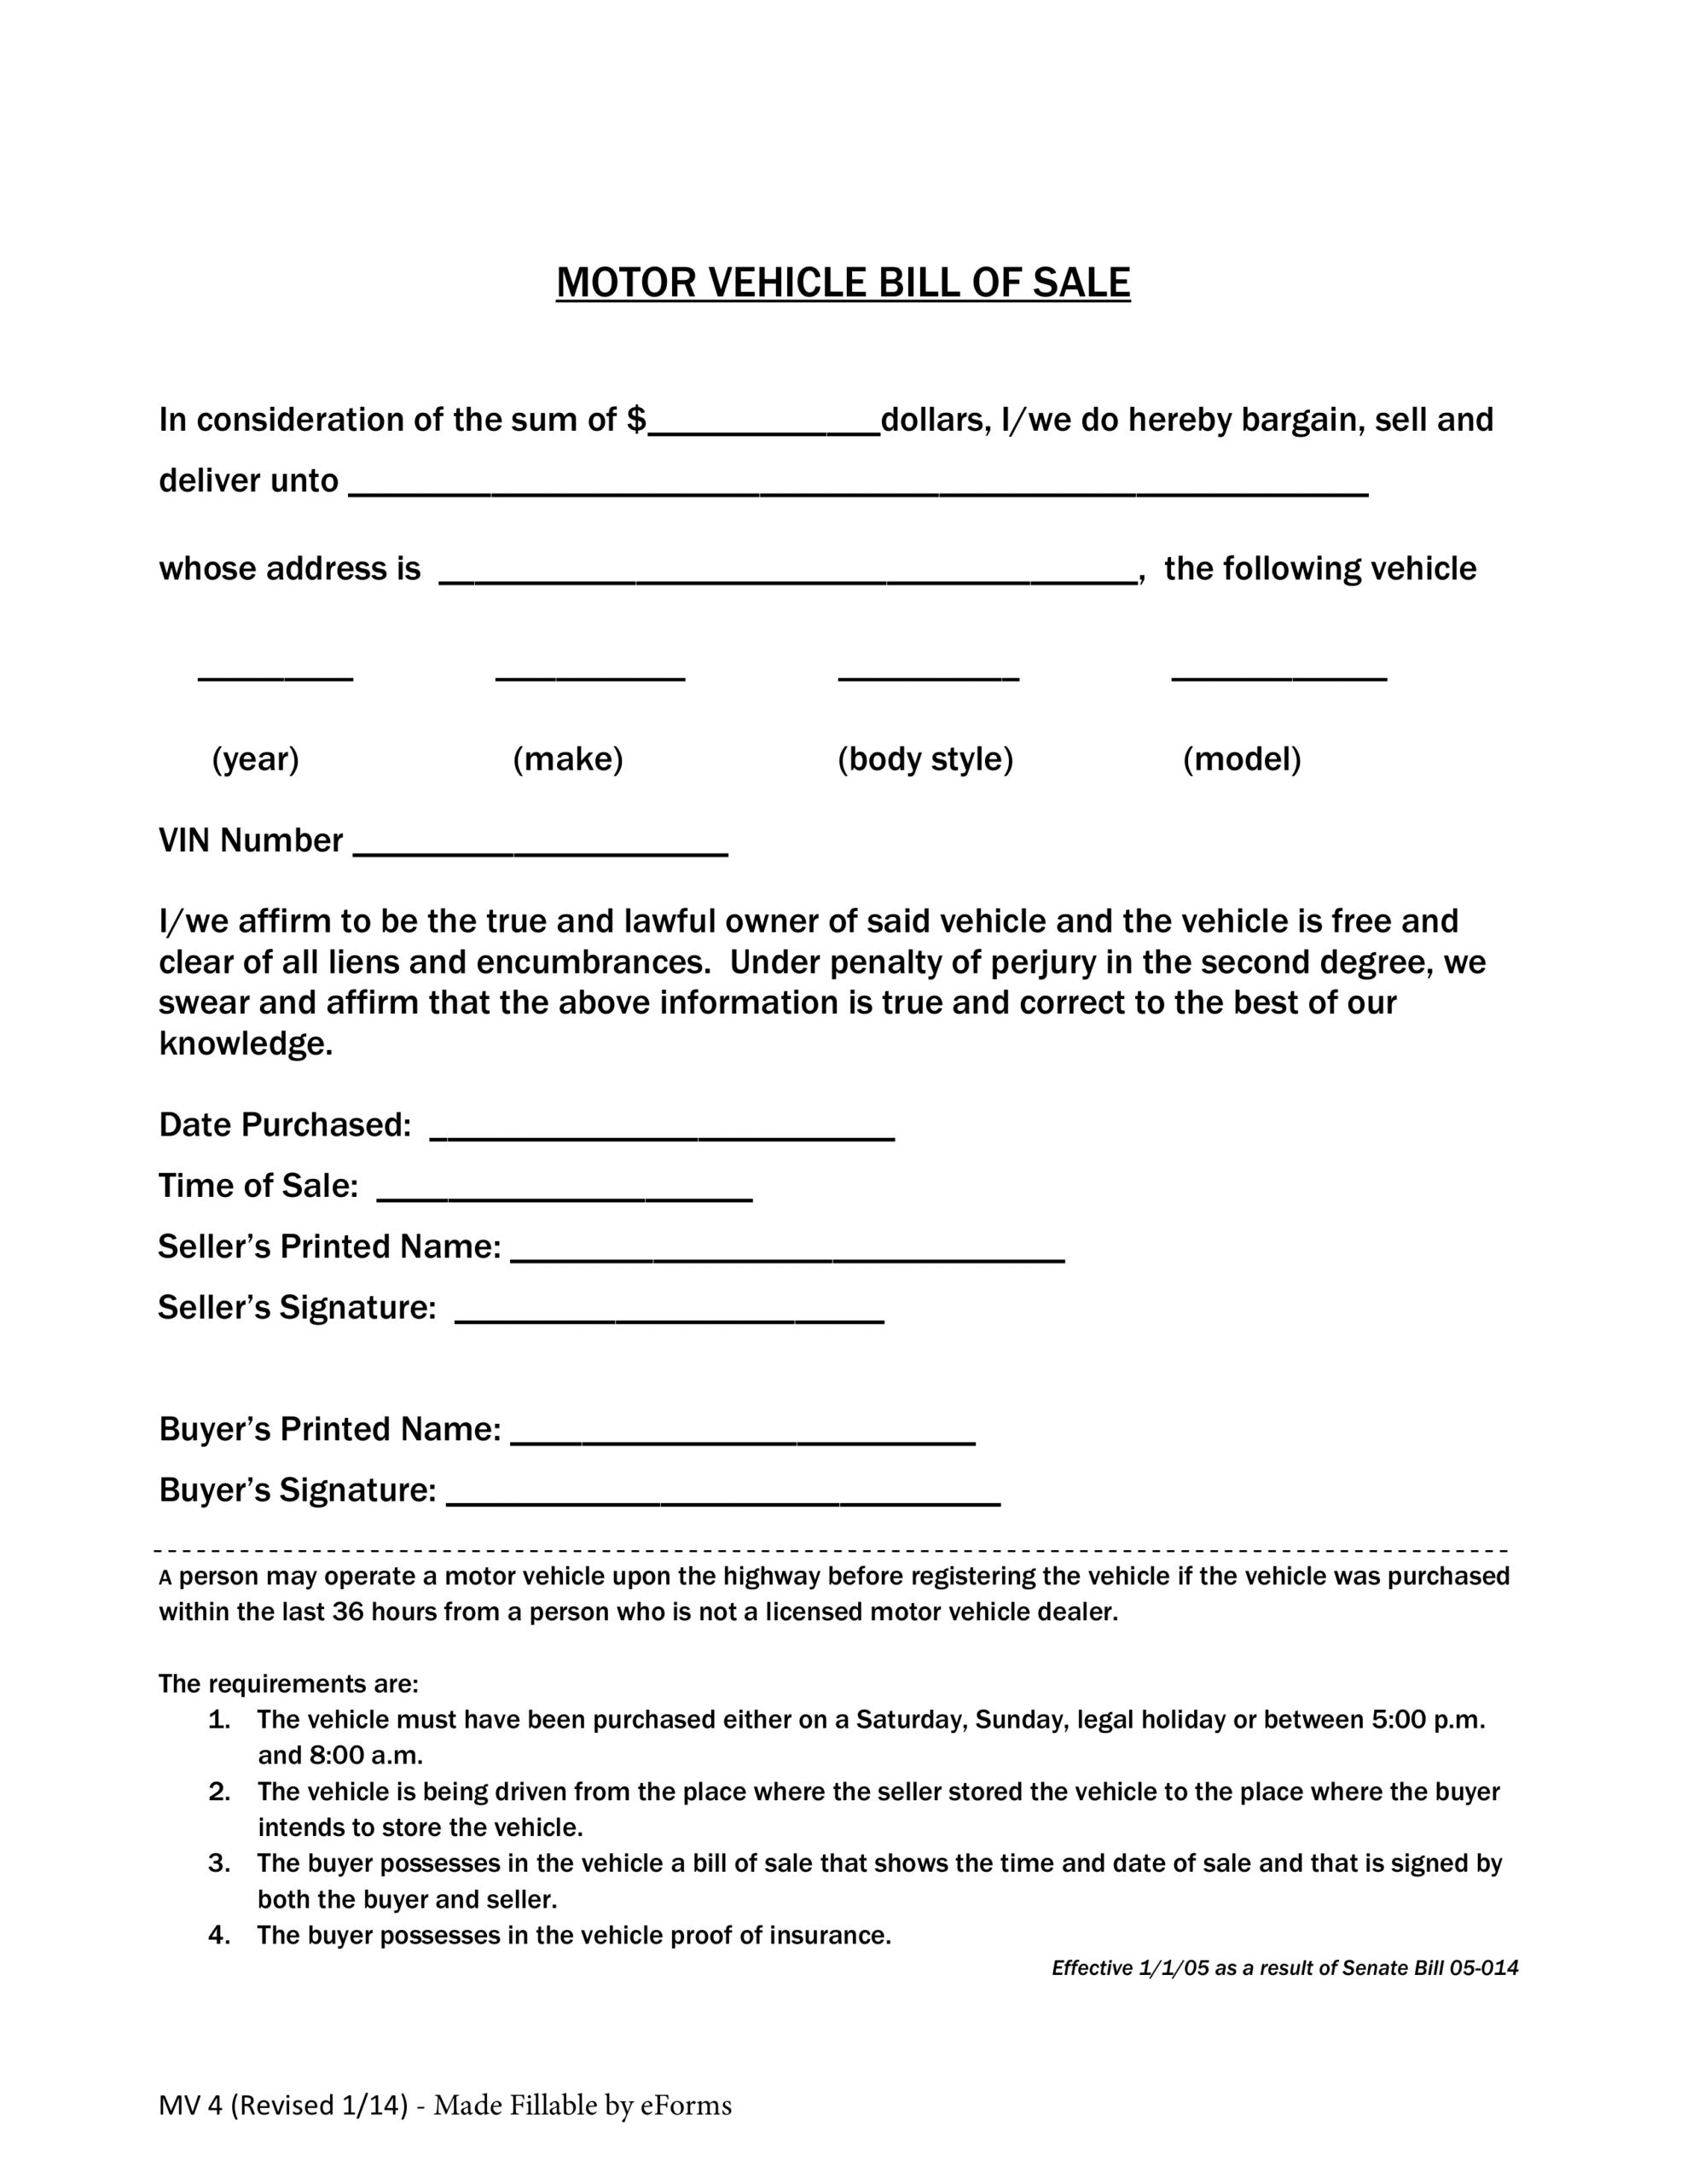 002 Vehicle Bill Of Sale Template Colorado Dmv Form Free Pdf Pertaining To Bill Of Sale Template Colorado